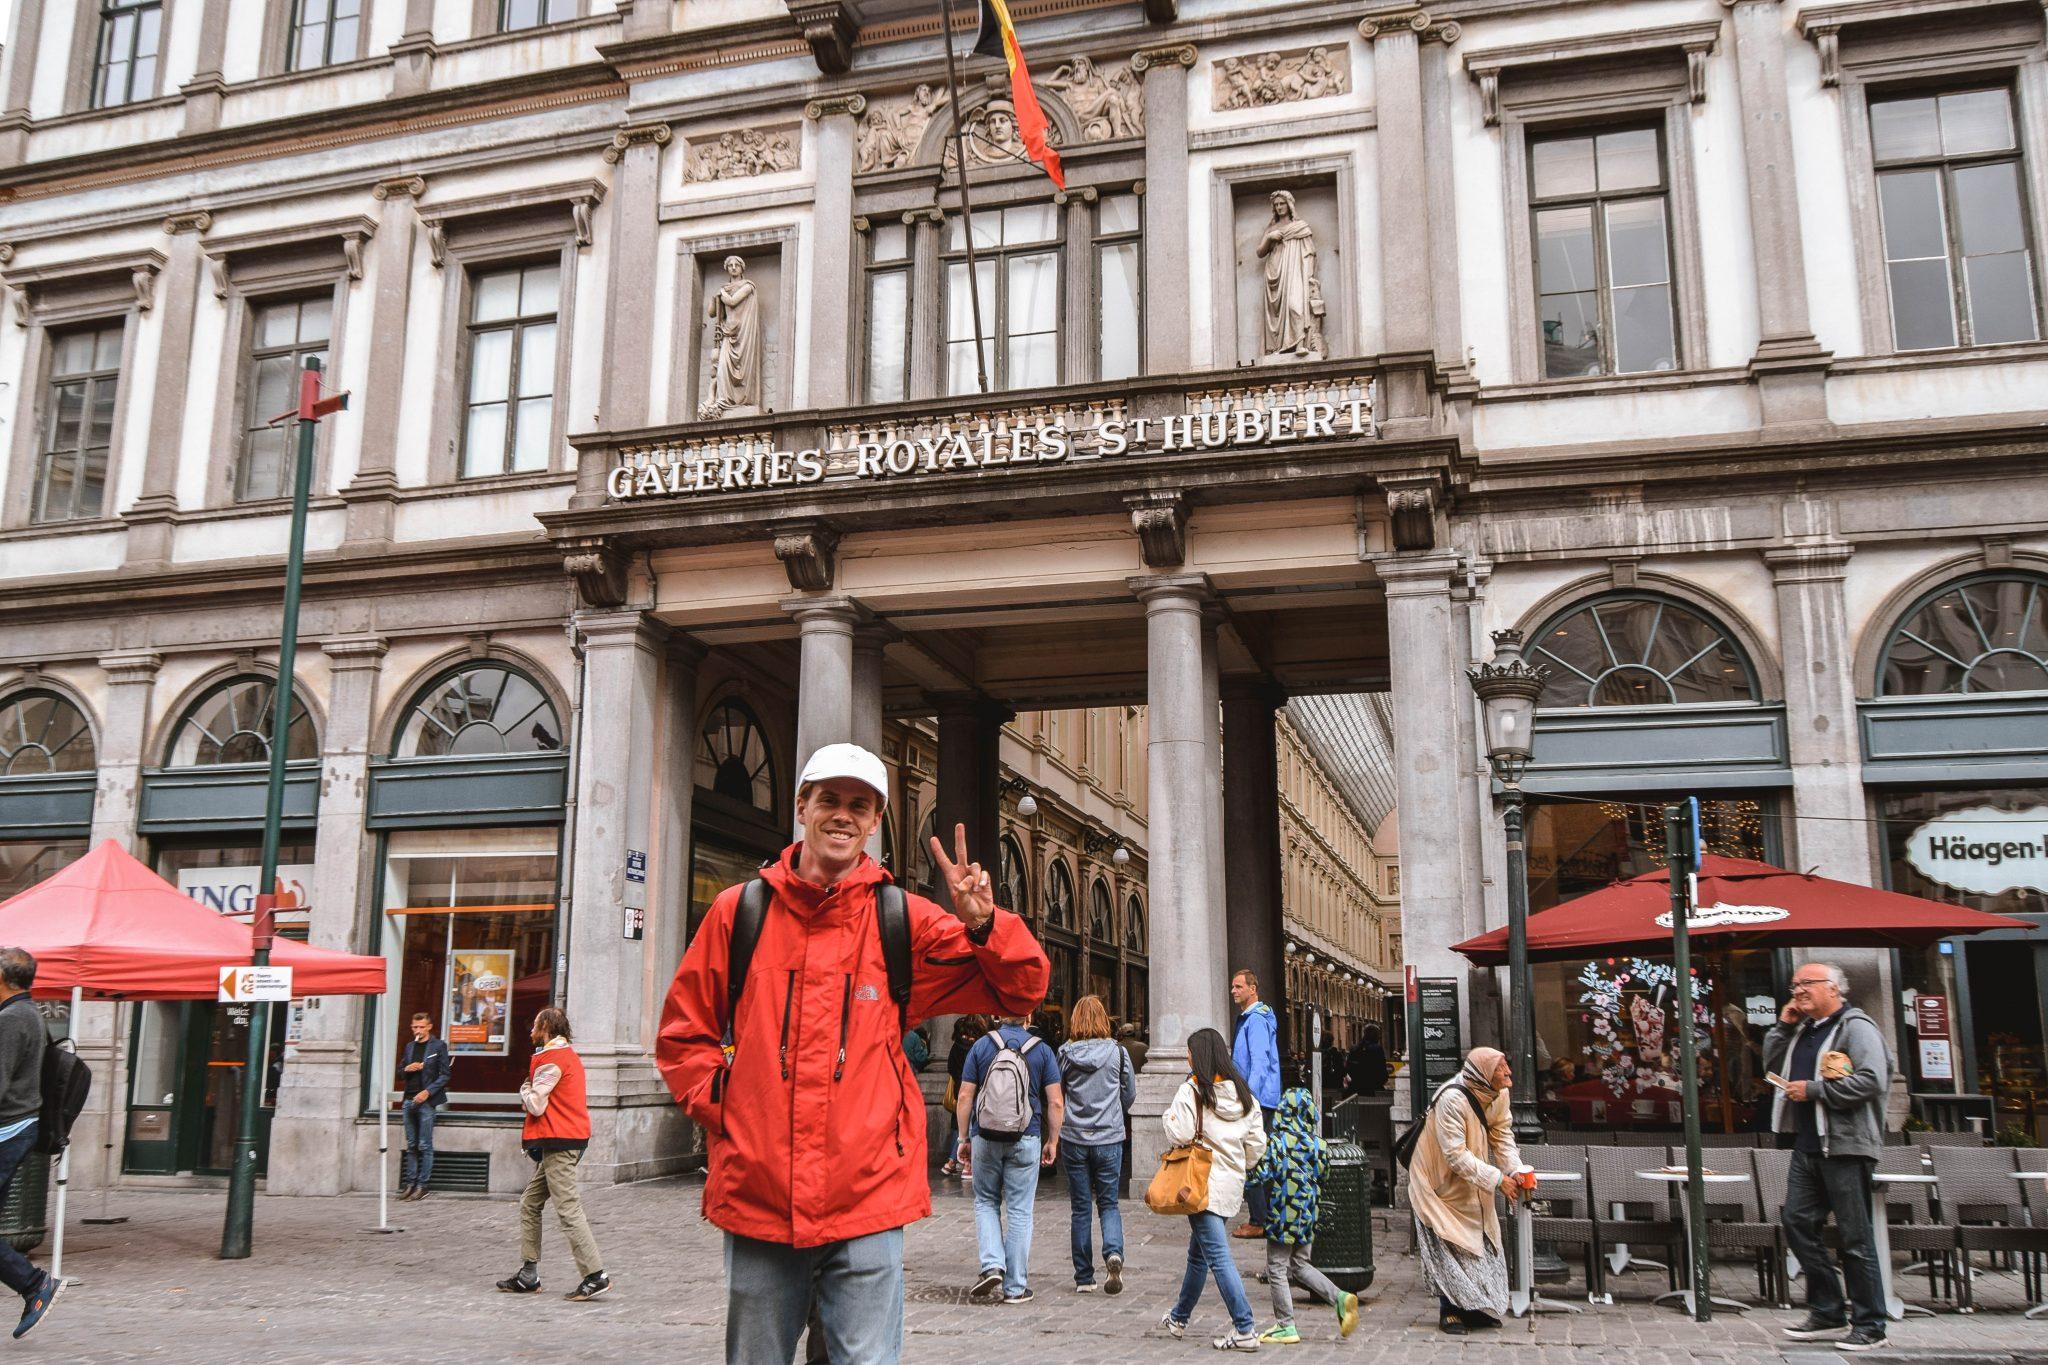 Wanderers & Warriors - Charlie & Lauren UK Travel Couple - Things To Do In Brussels In A Weekend - Grand Place Brussels Galeries Royales Saint-Hubert